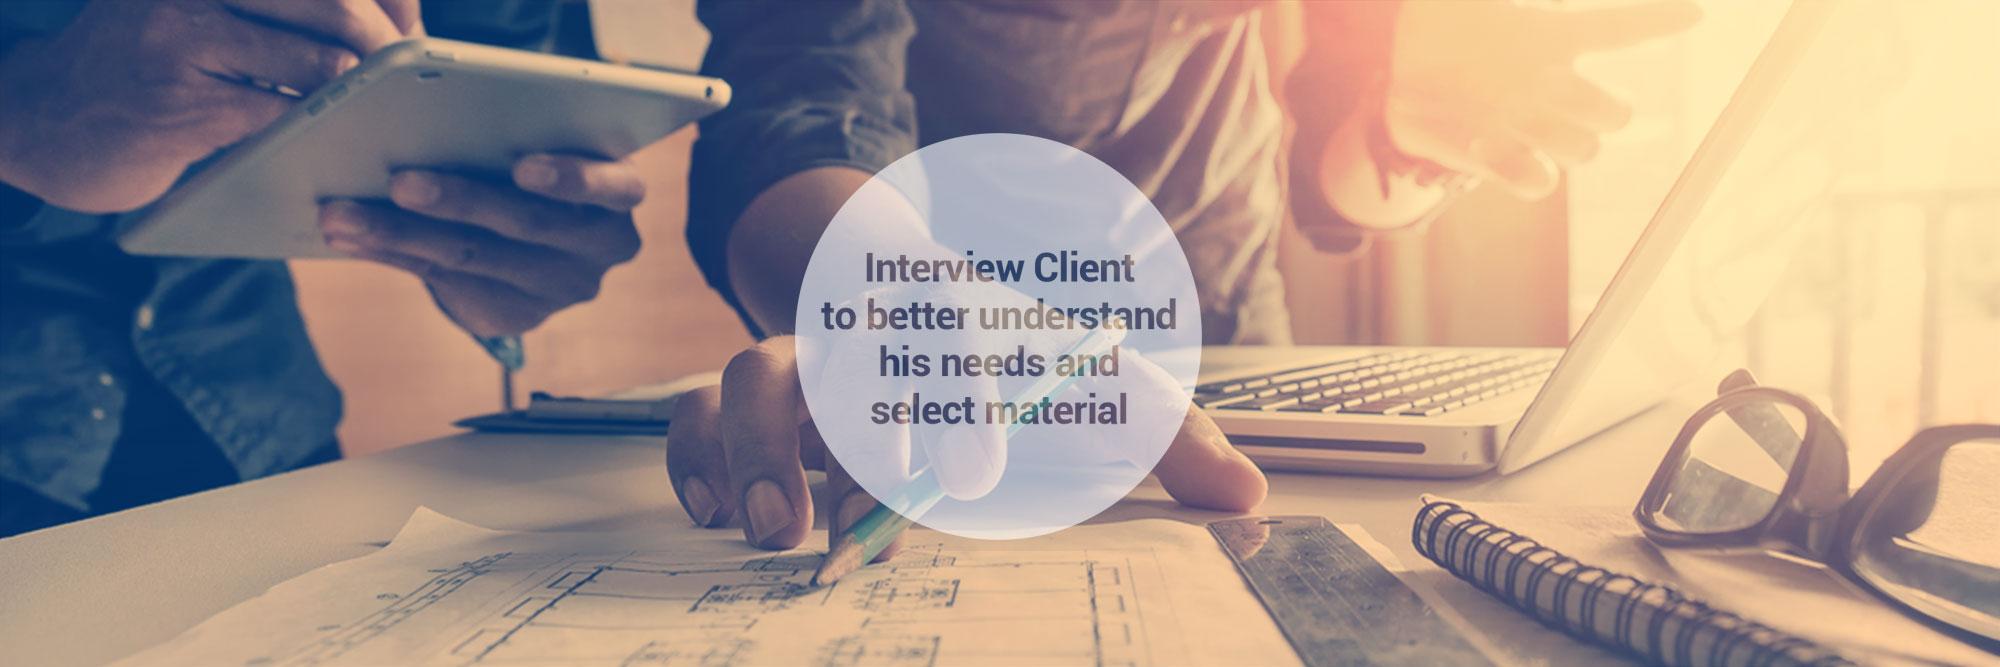 Interview client